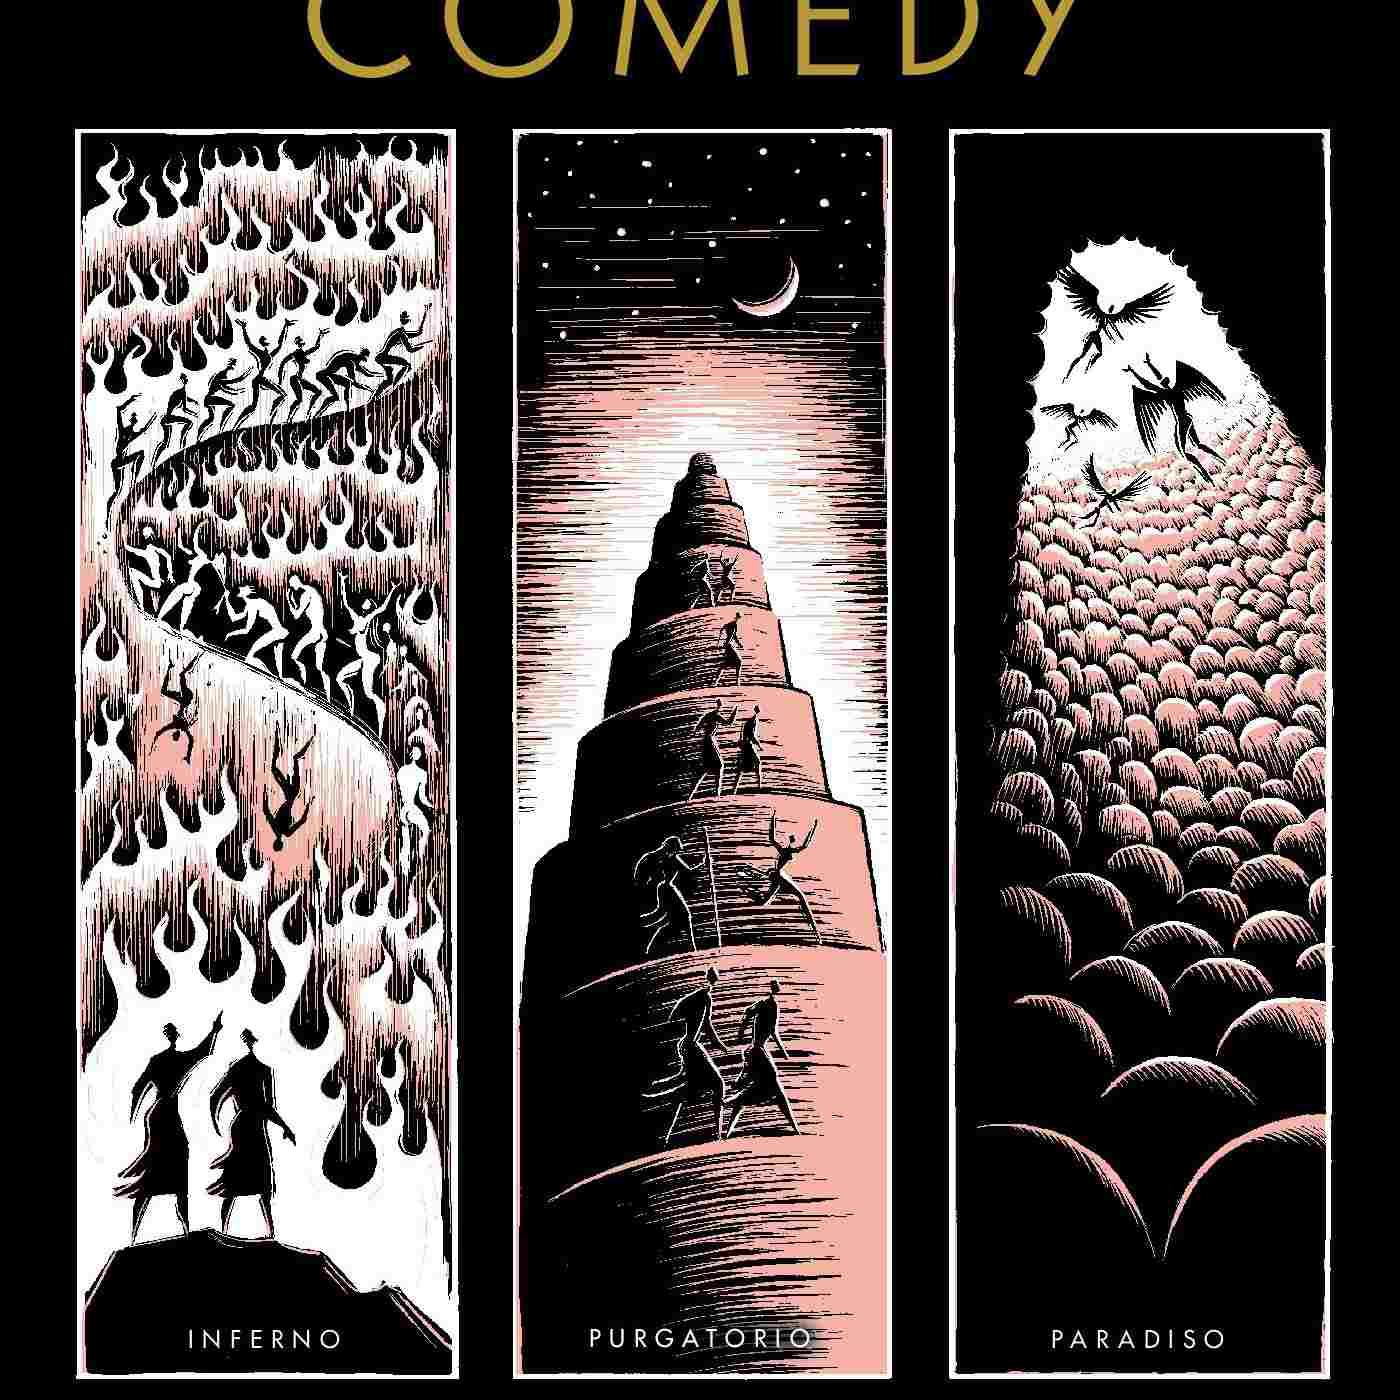 The Divine Comedy, by Dante Alighieri